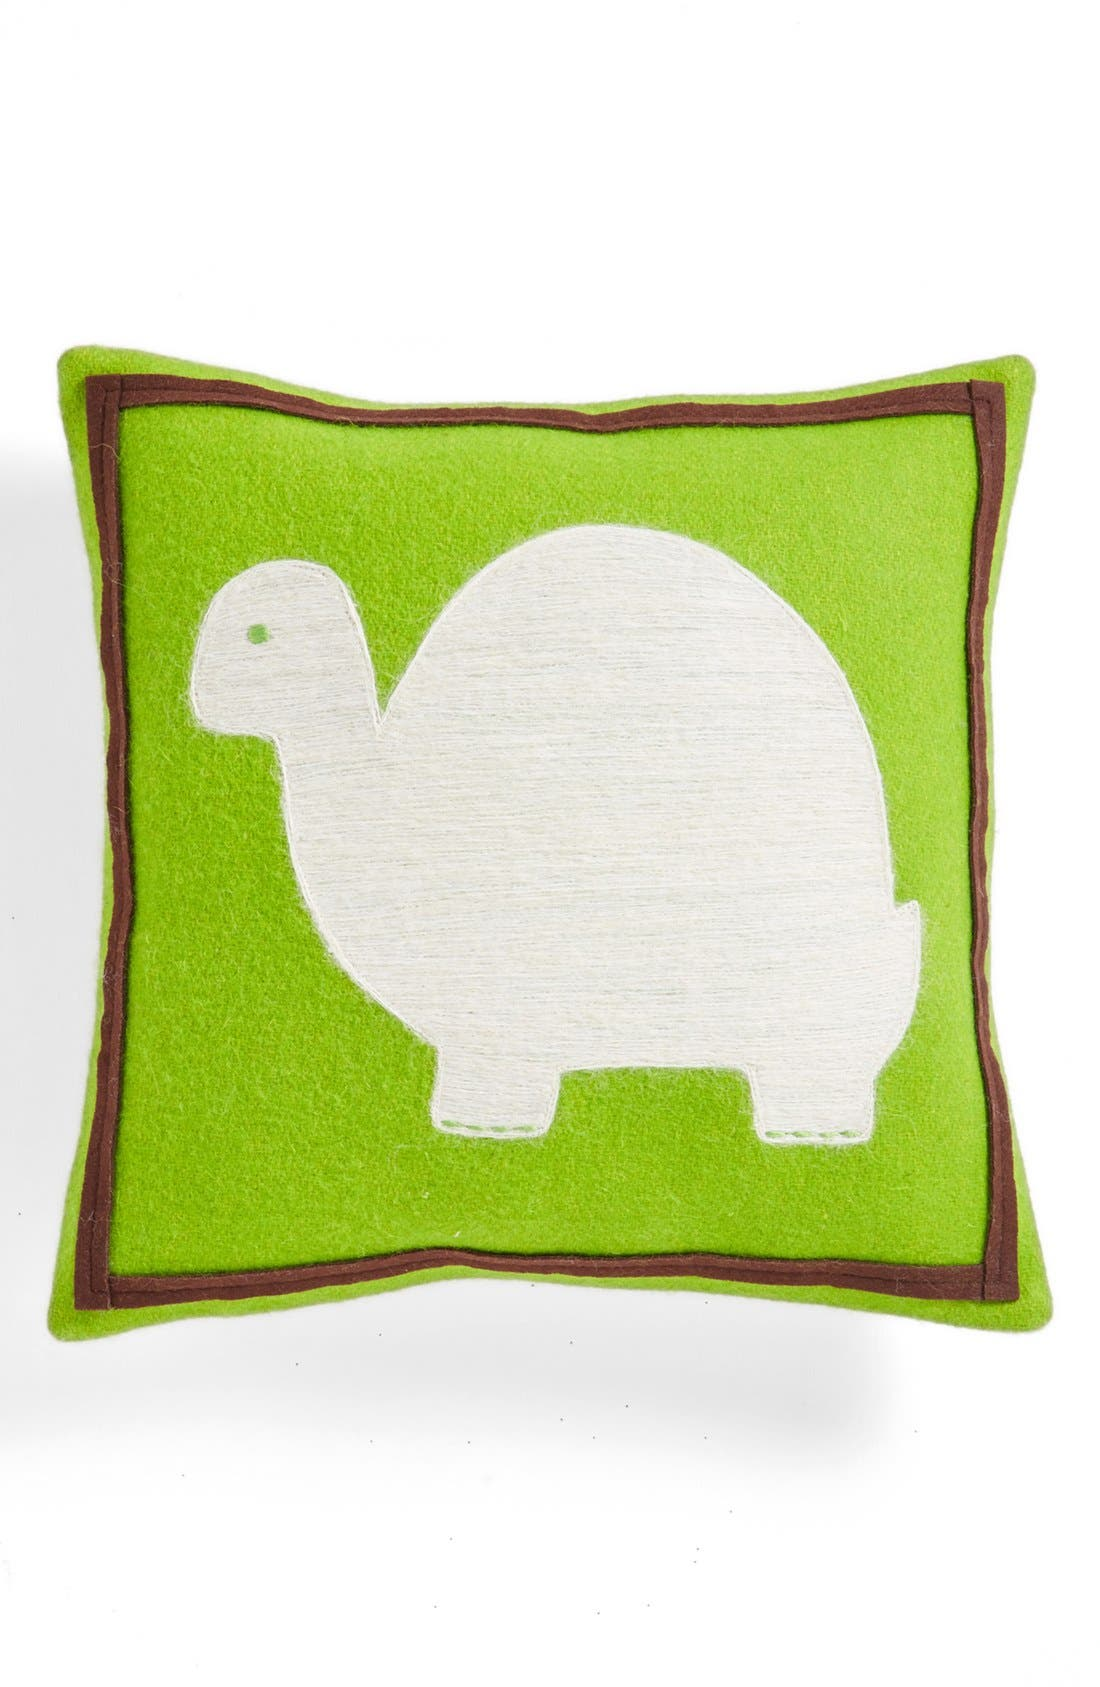 Main Image - Amity Home 'Turtle' Decorative Pillow